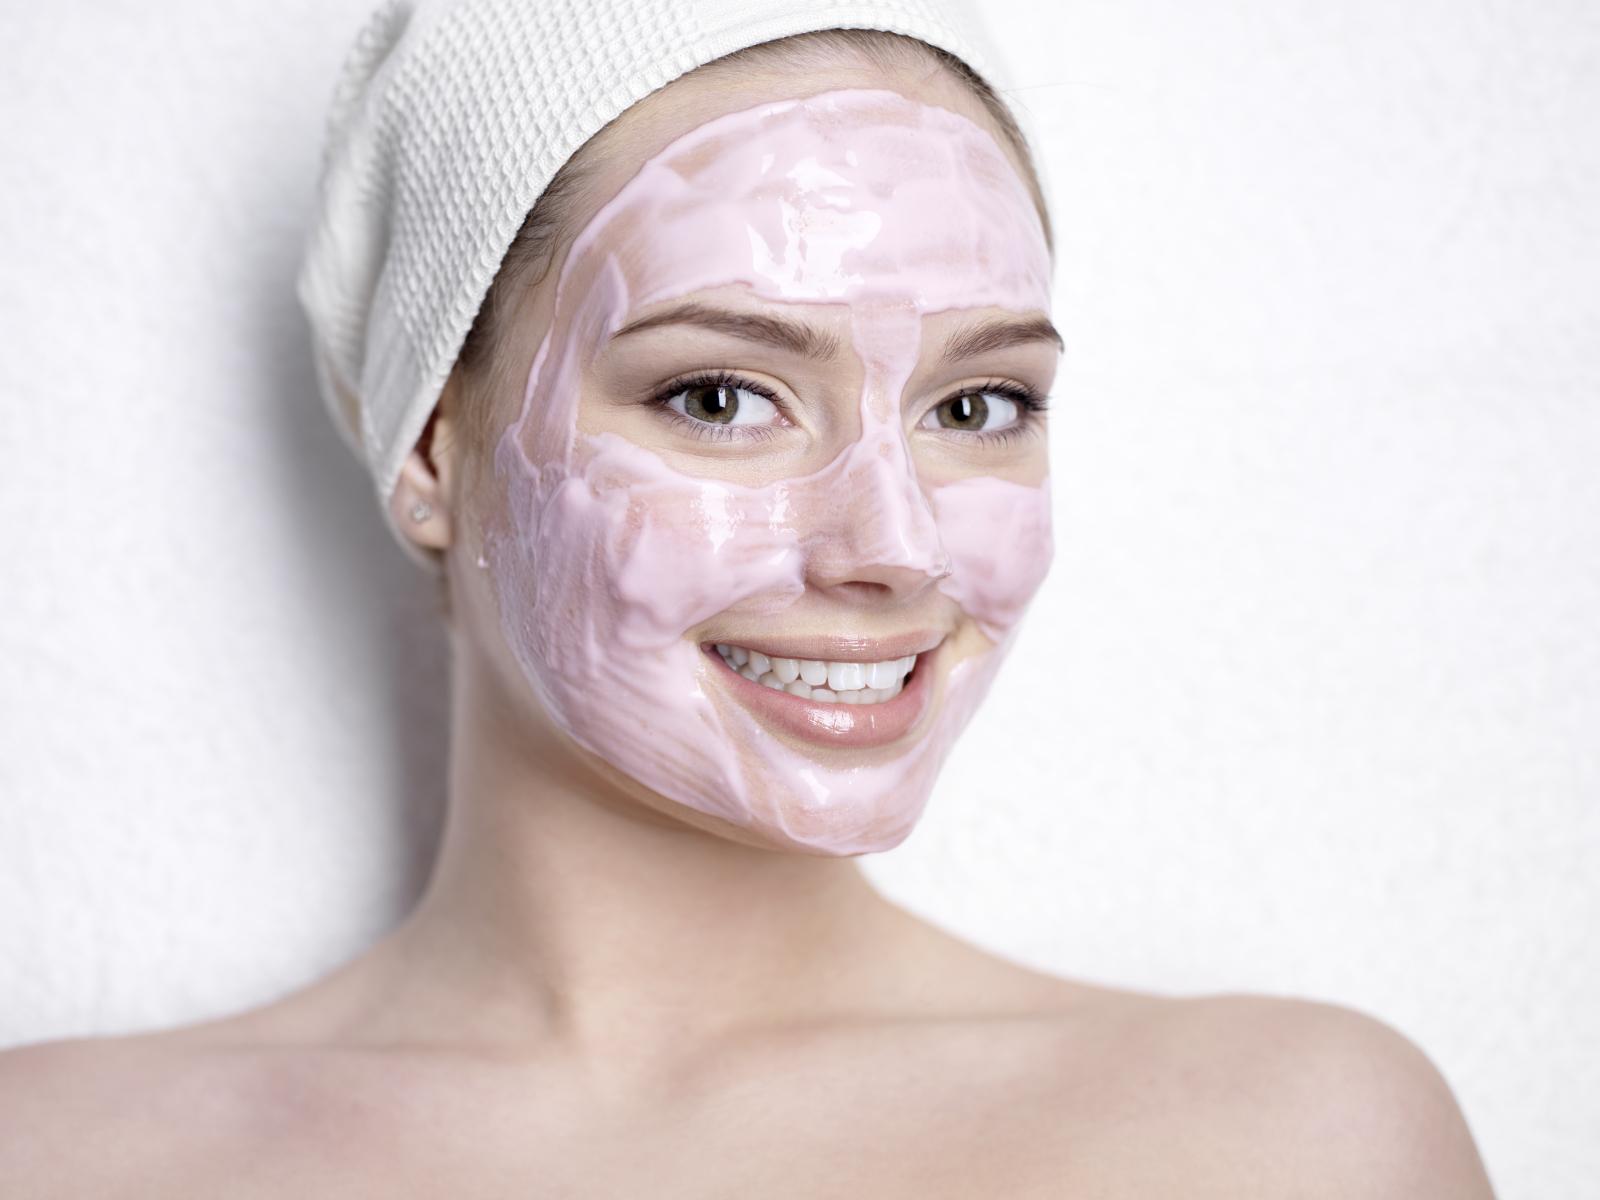 Maschere antirughe fai da te: 10 ricette da non perdere